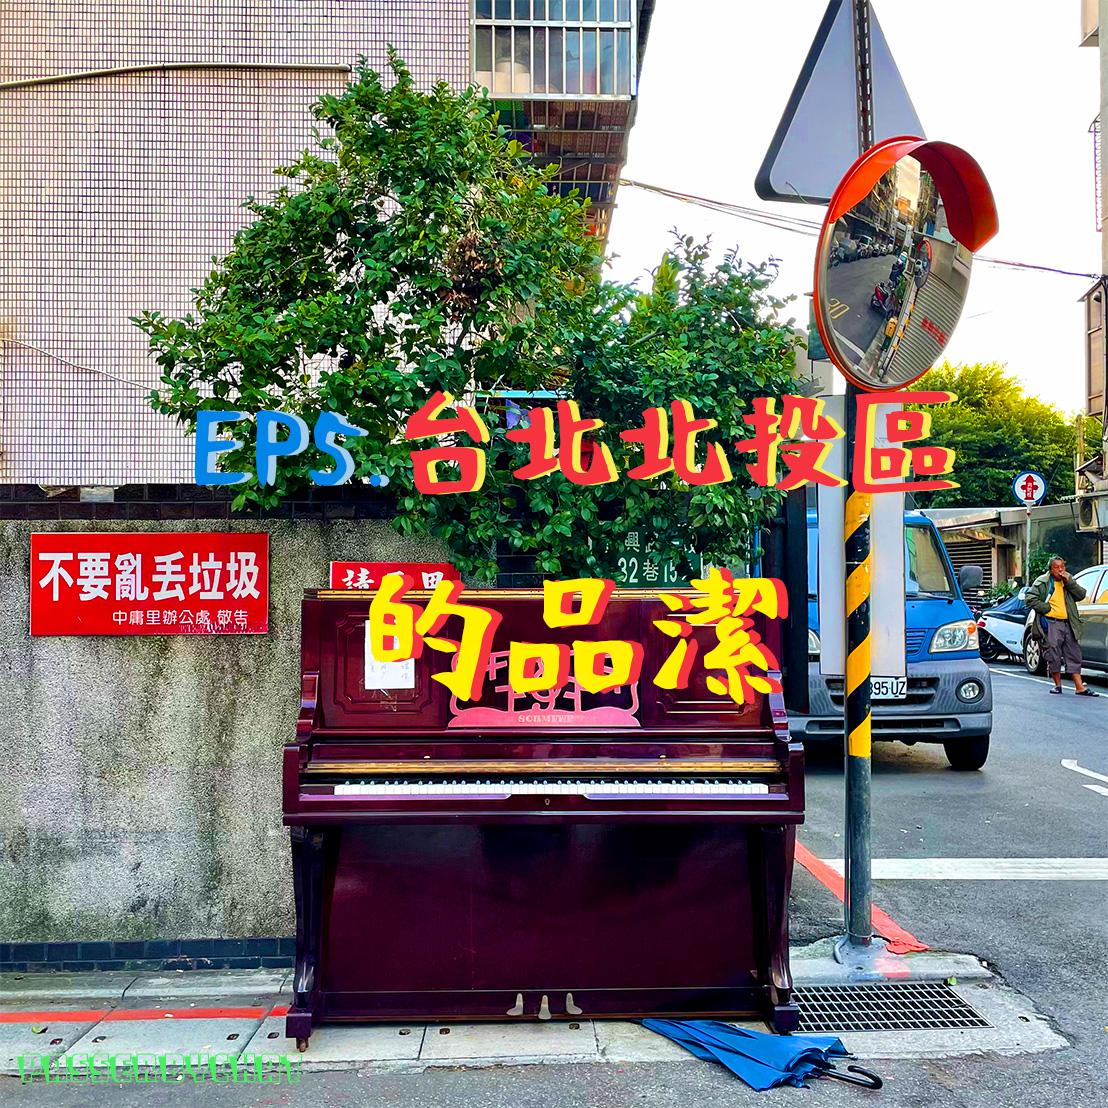 EP5 台北北投區的品潔